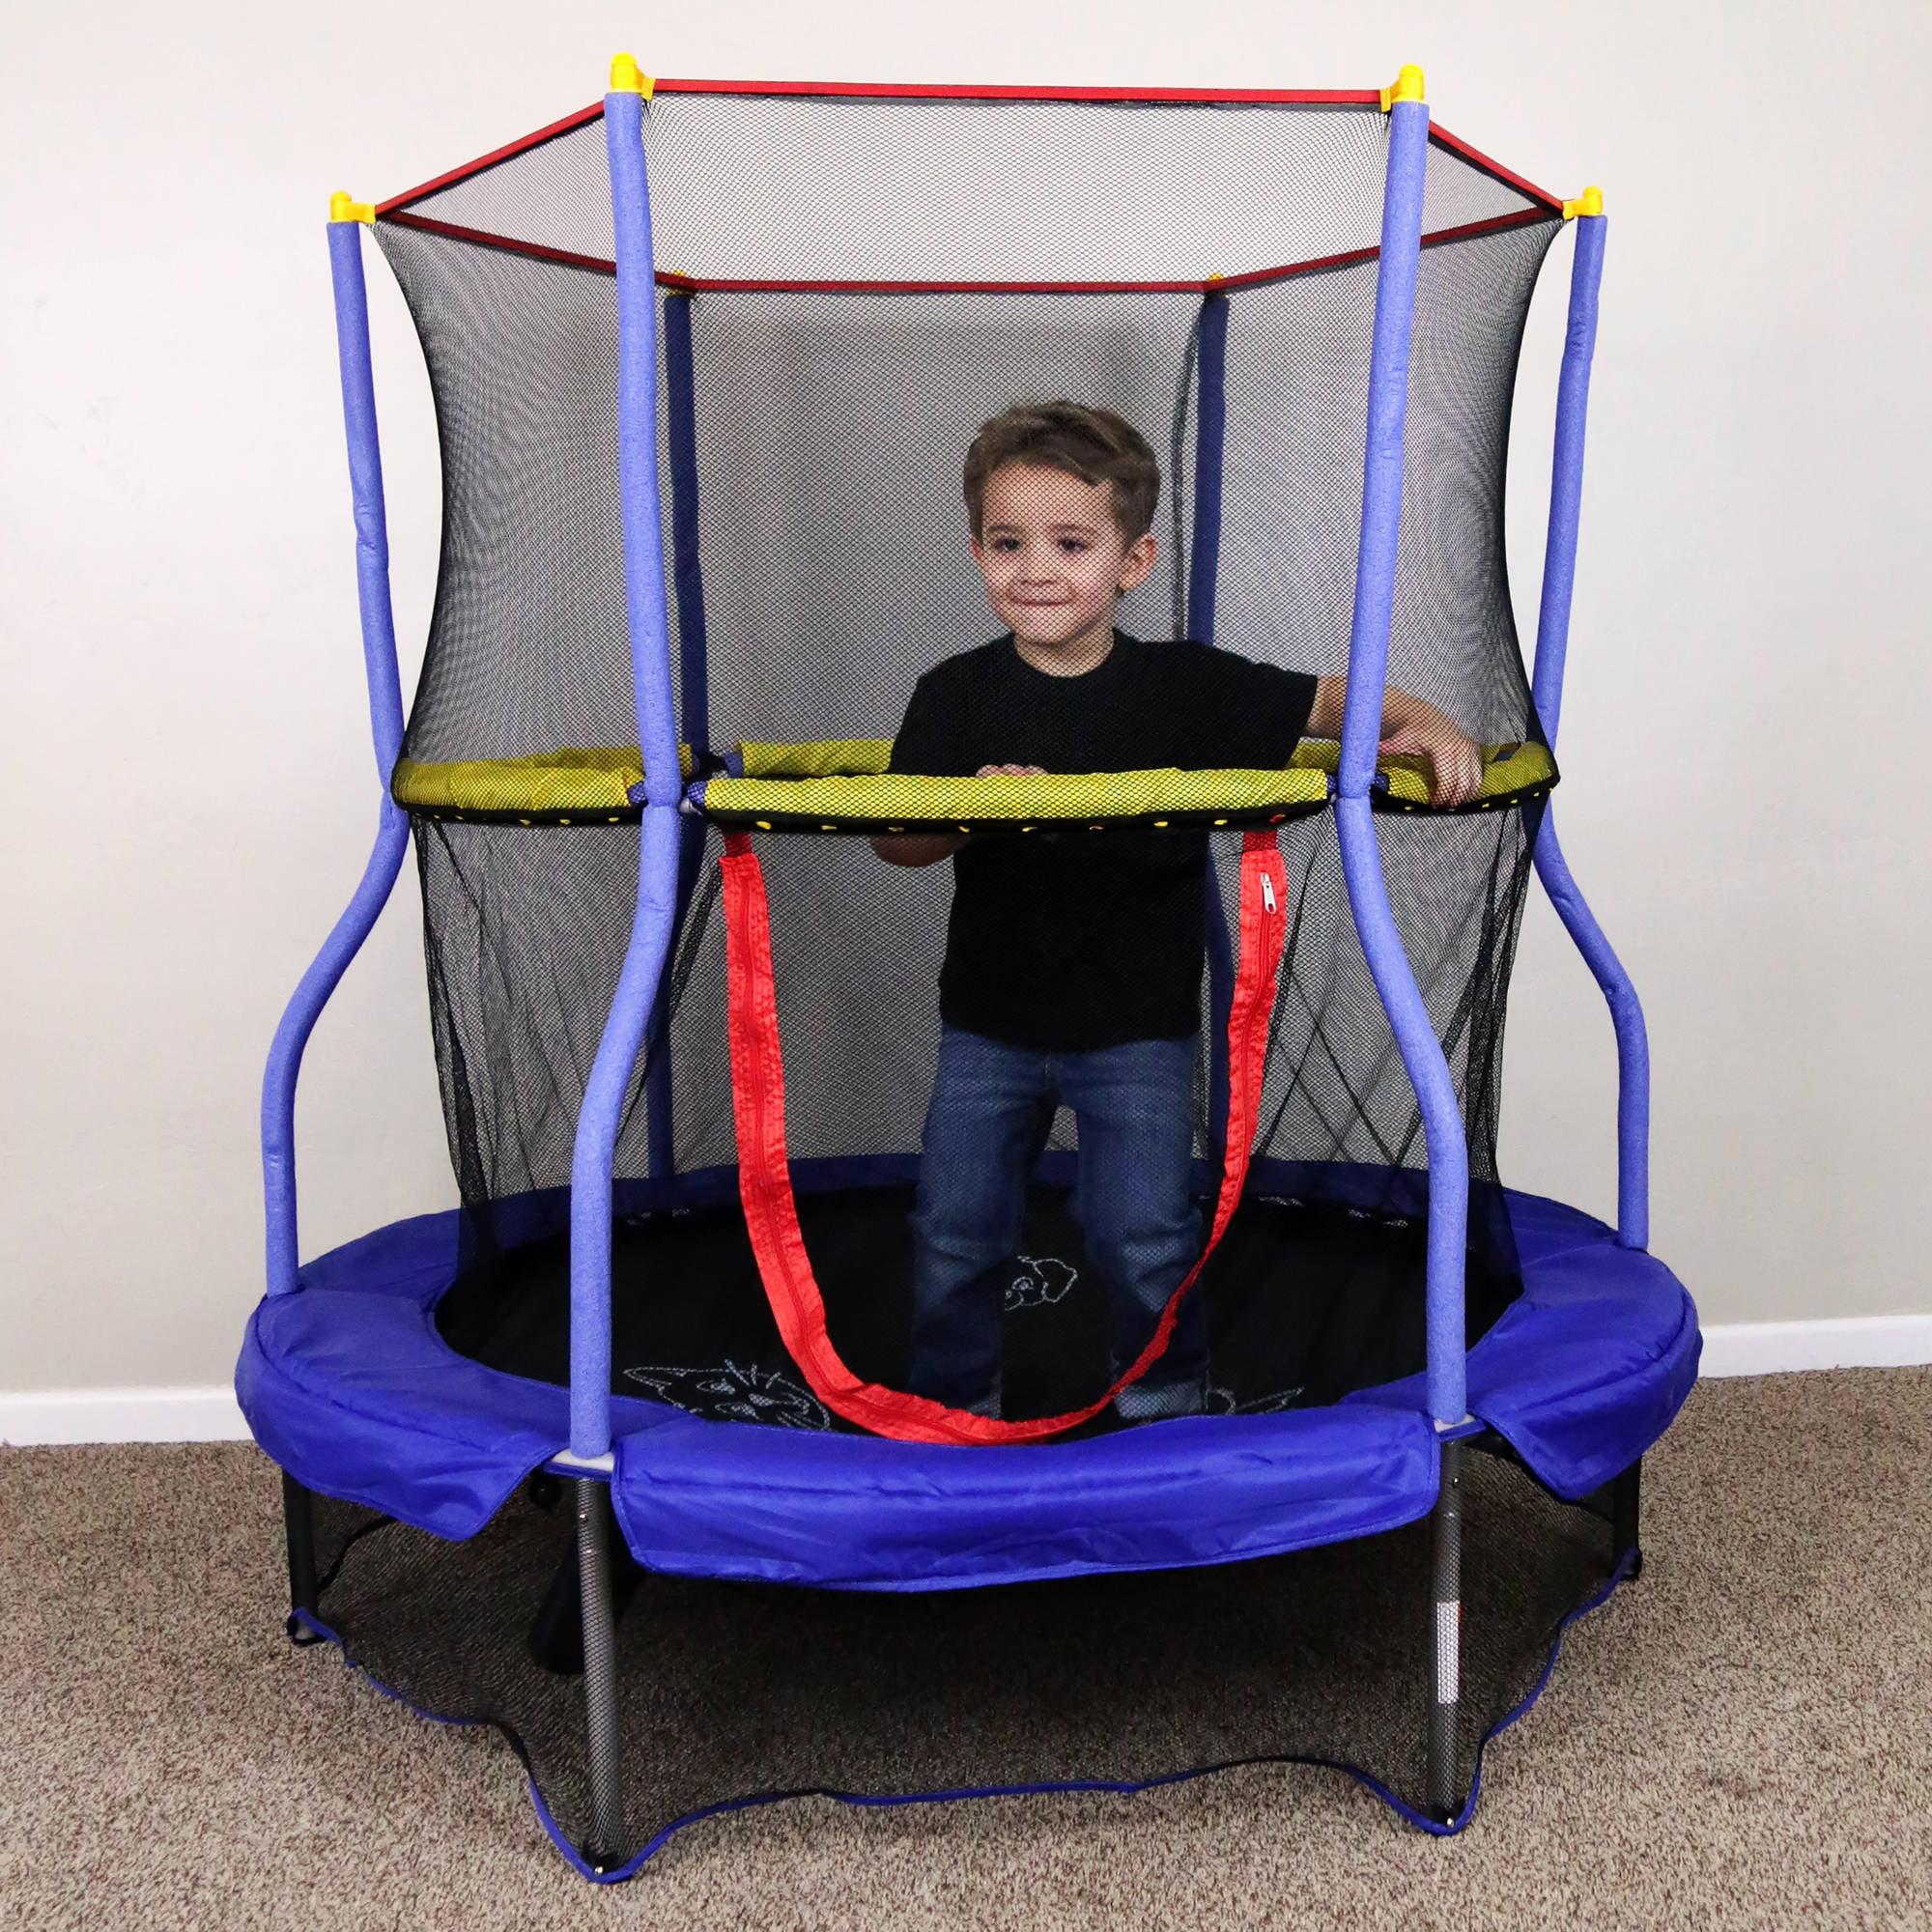 skywalker 15 u0027 trampoline u0026 enclosure bundle walmart com